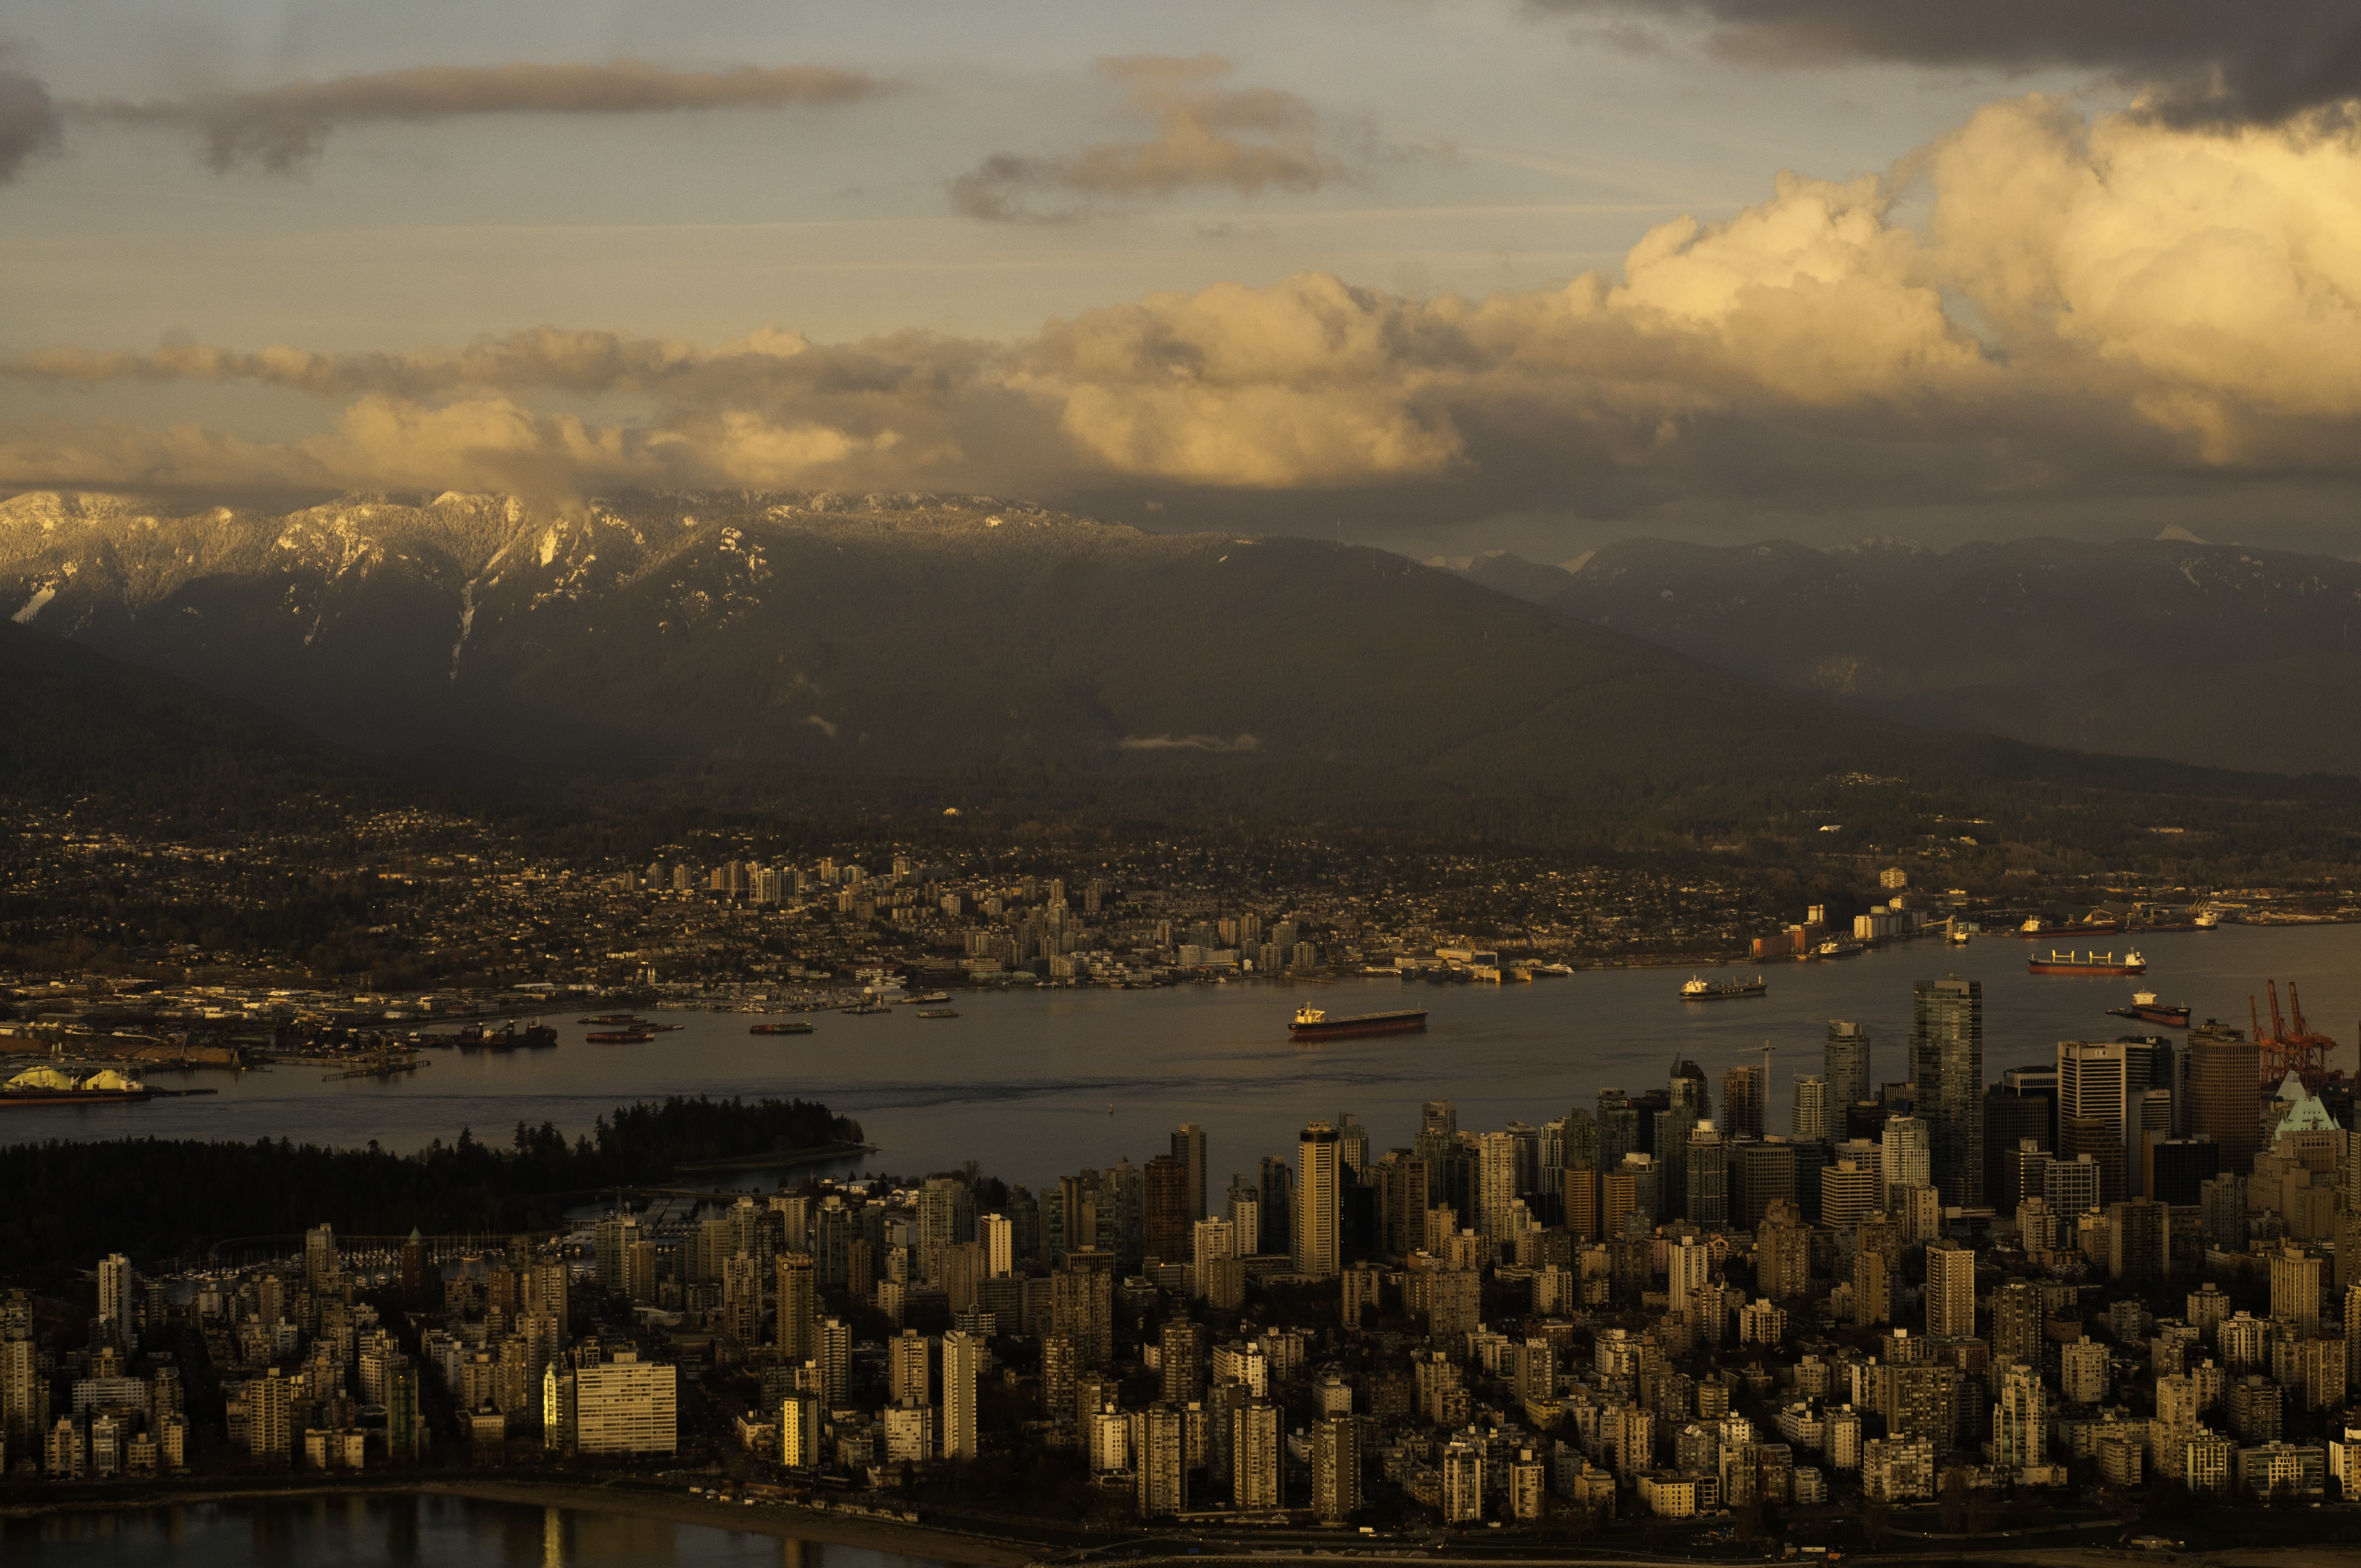 VancouverDSC_6787.jpg